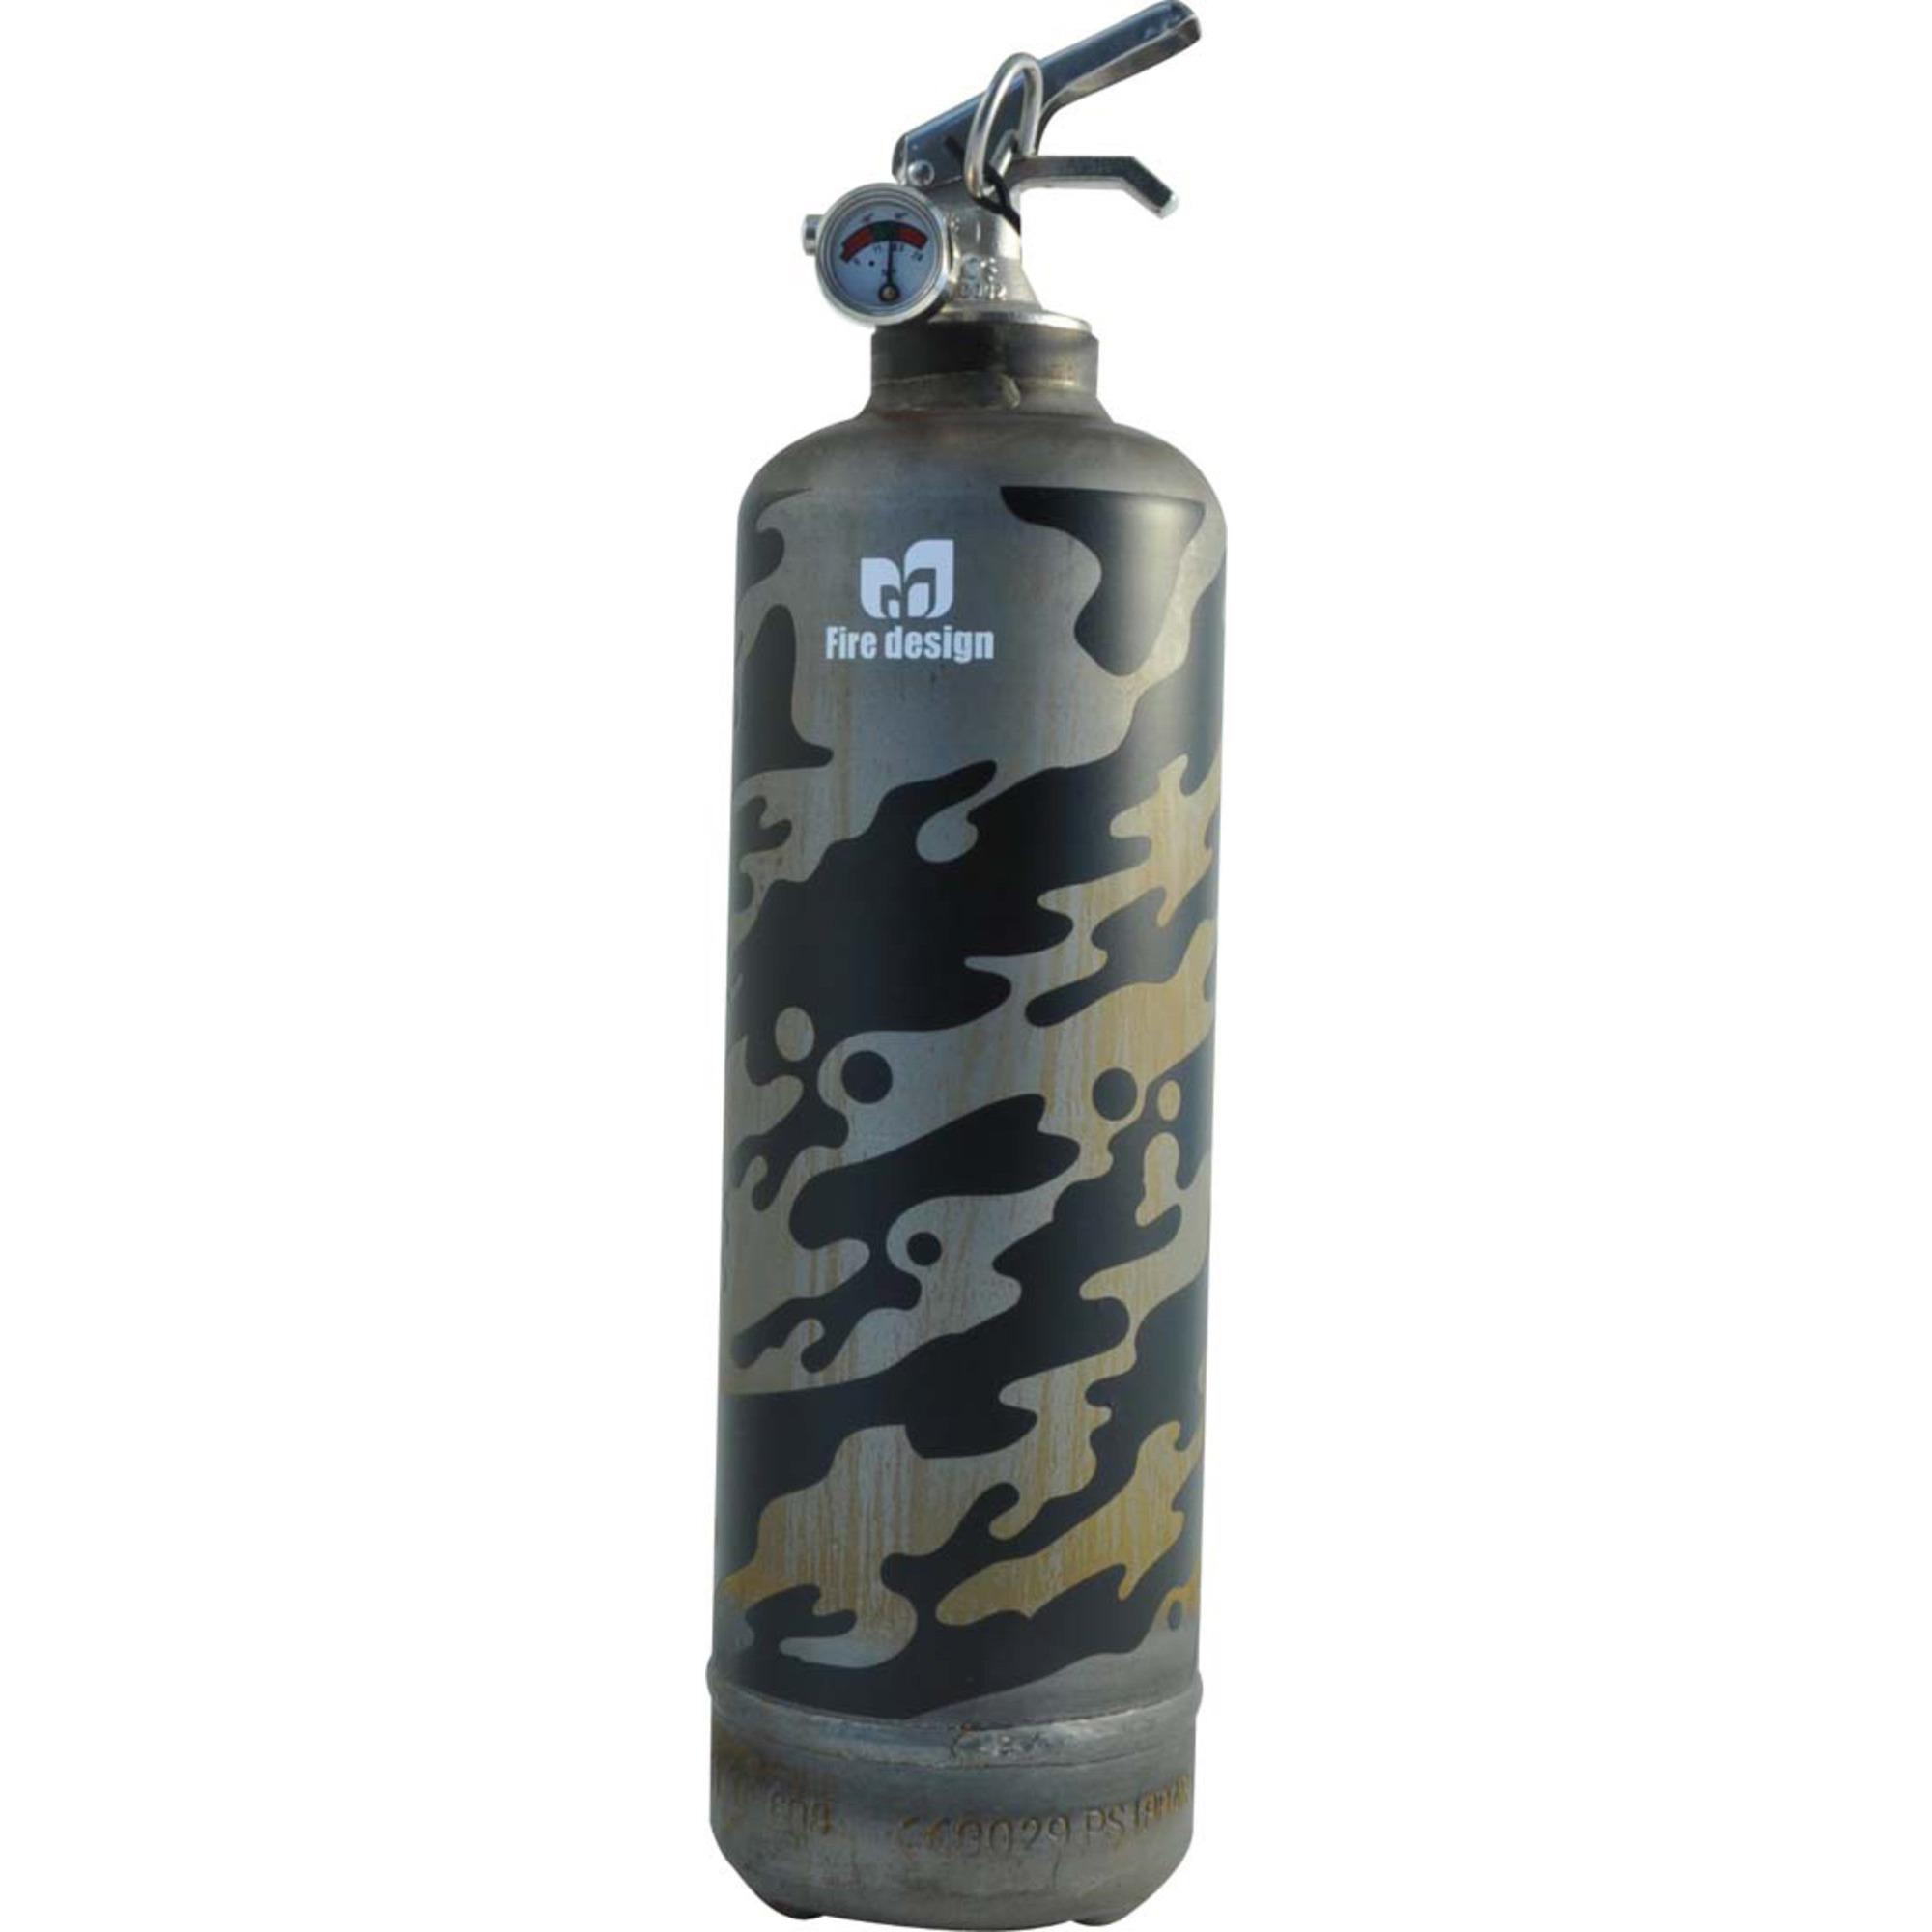 Fire Design Brandsläckare Military Brut/Noir